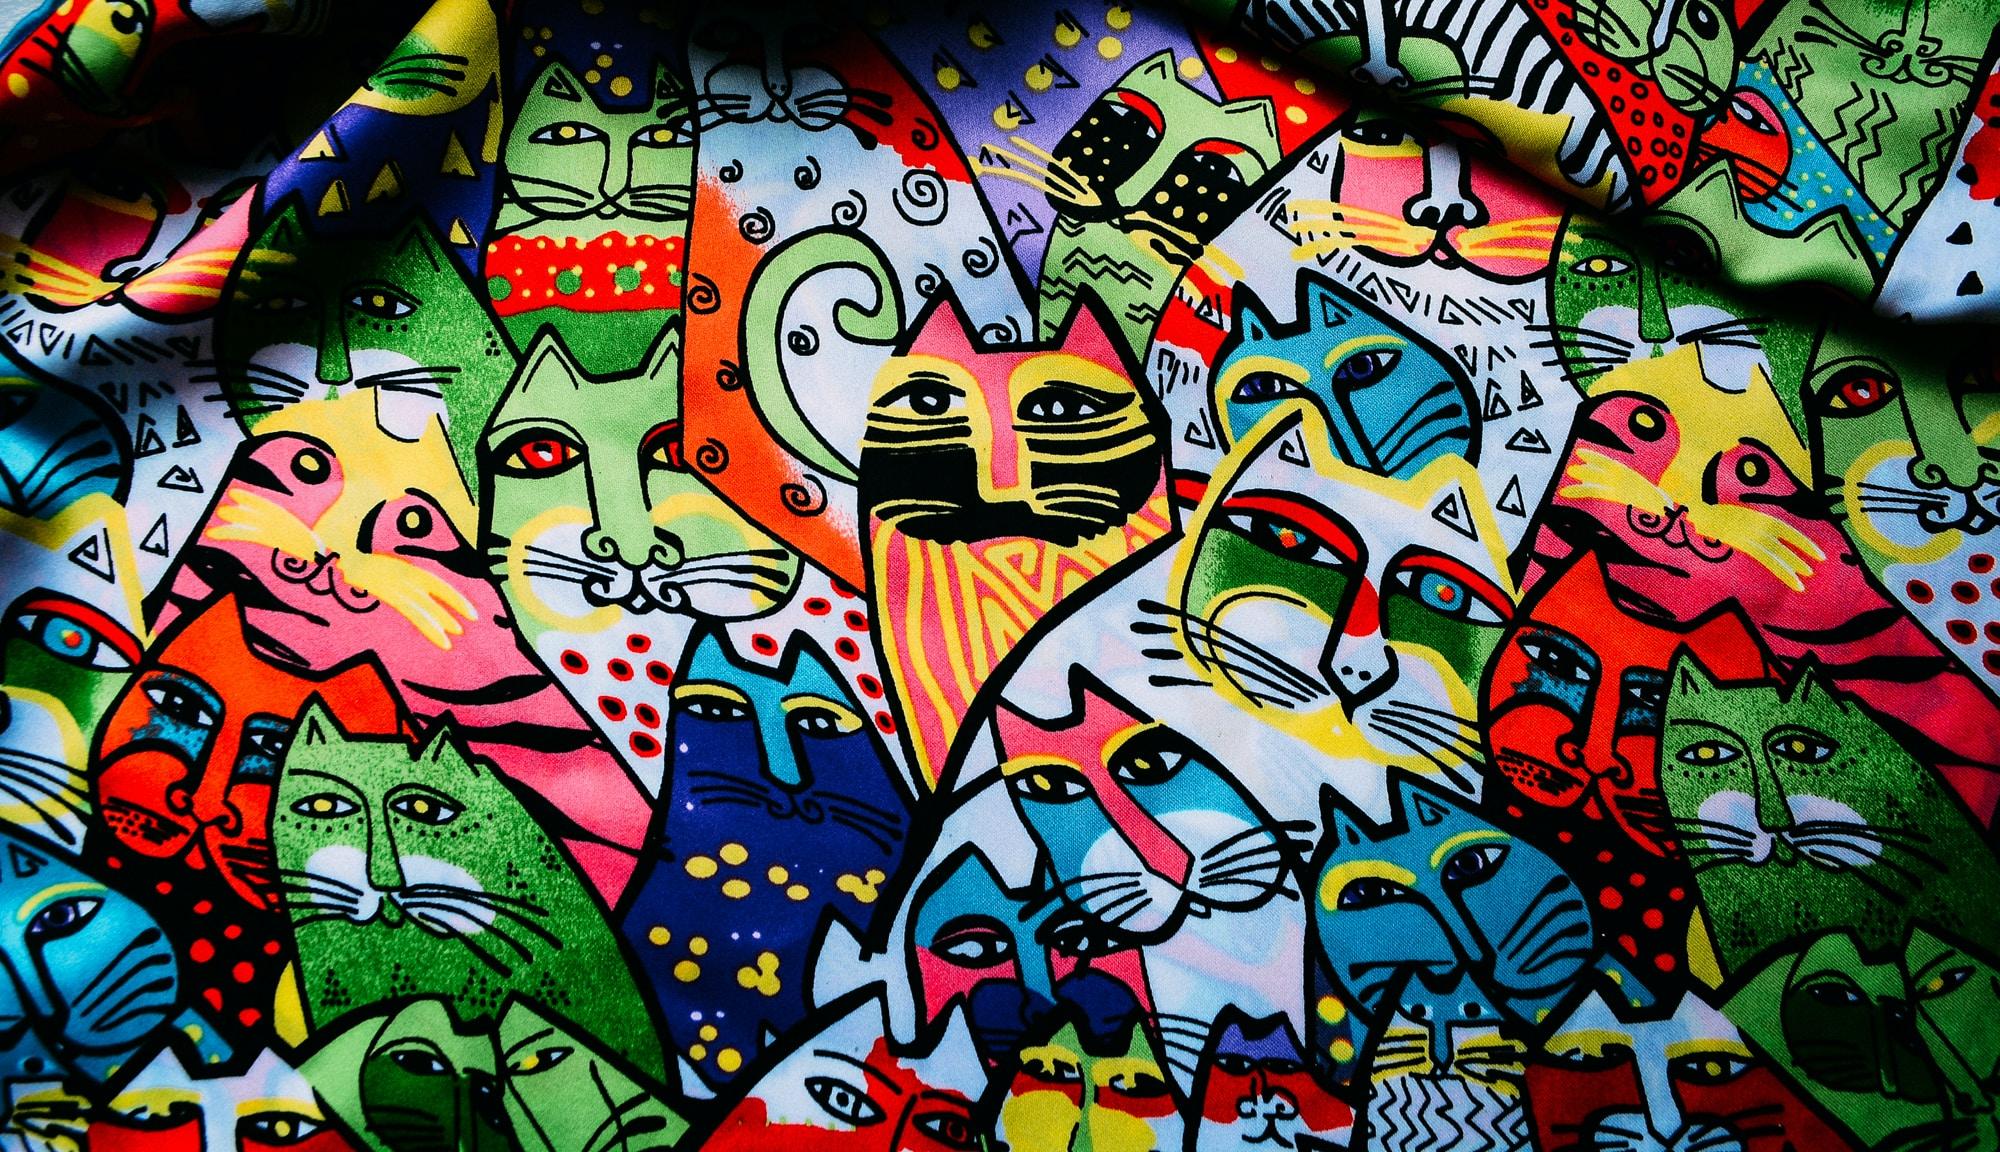 Graffiti Wallpaper I Love You 6579 Loadtve